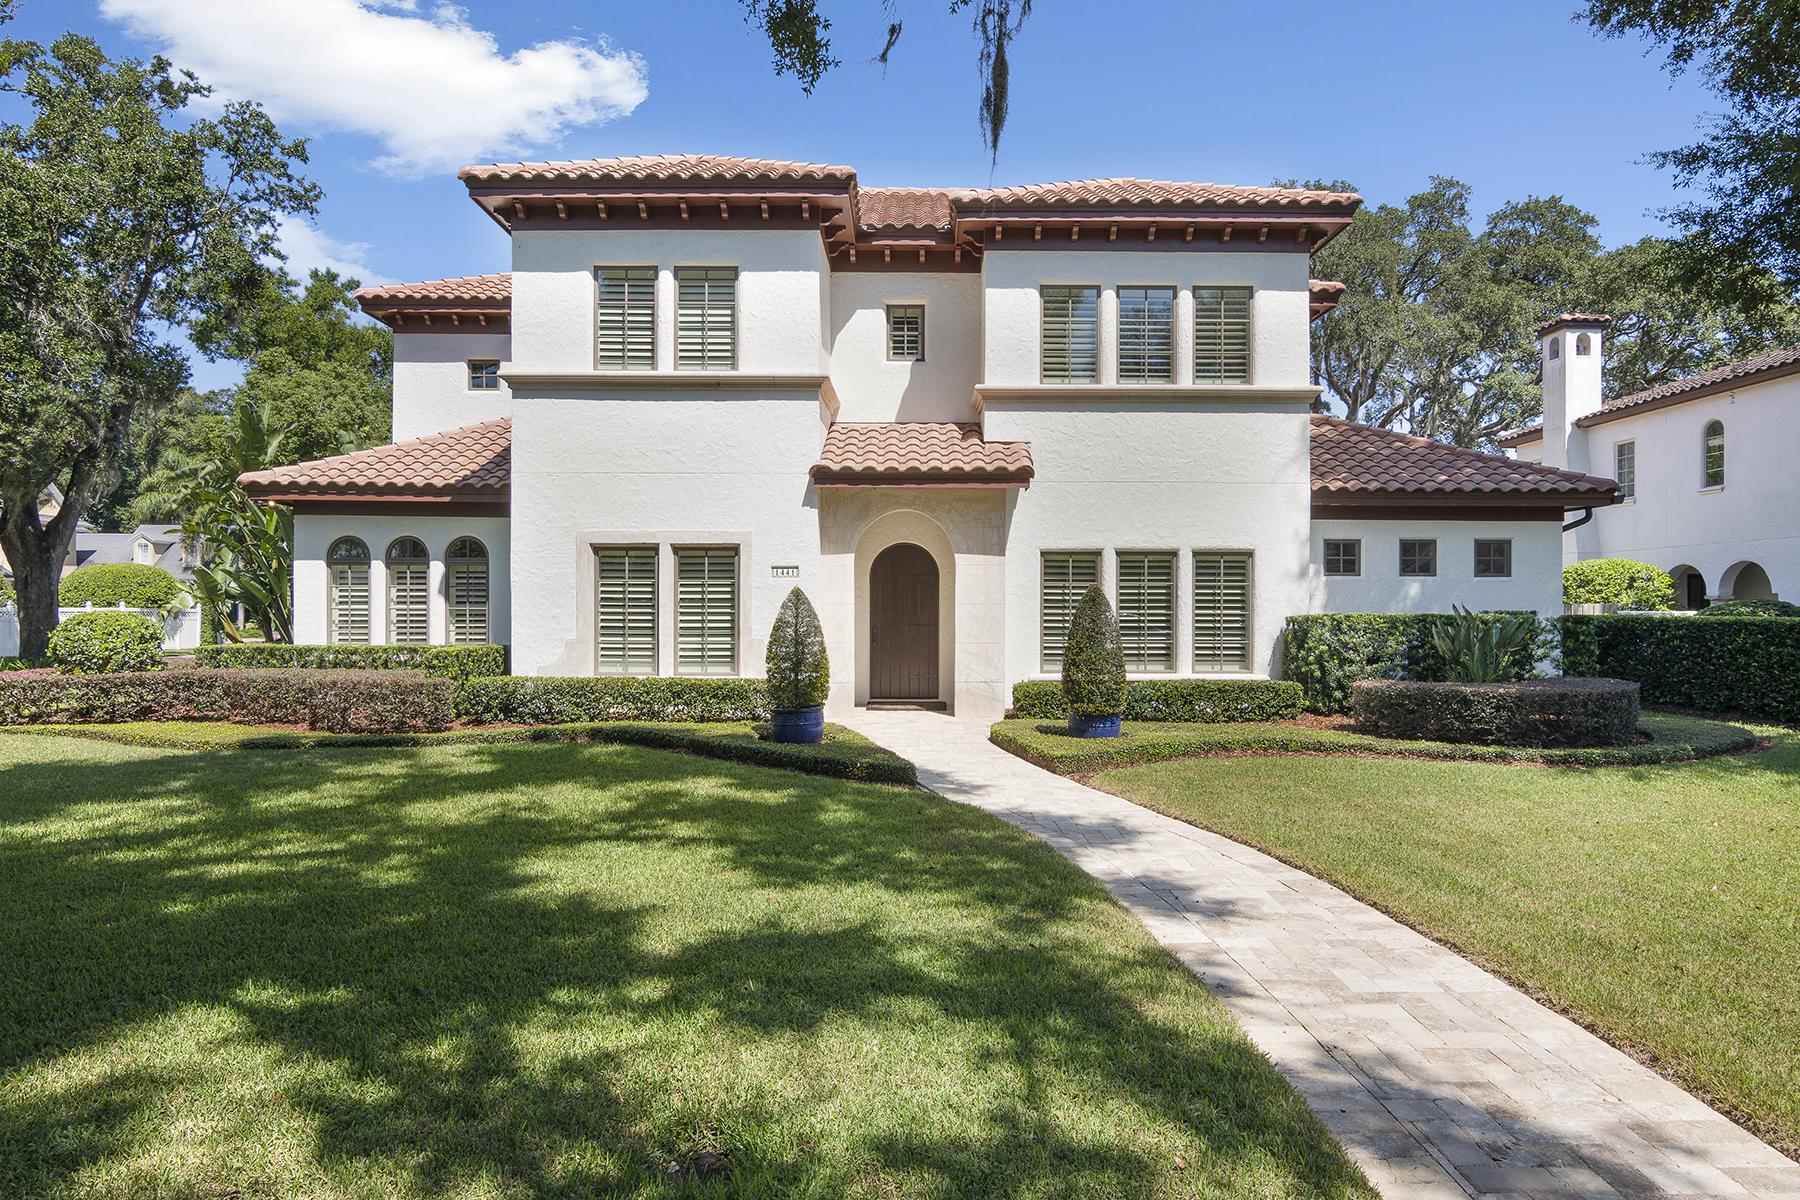 Single Family Homes por un Venta en WINTER PARK 1441 Place Picardy, Winter Park, Florida 32789 Estados Unidos